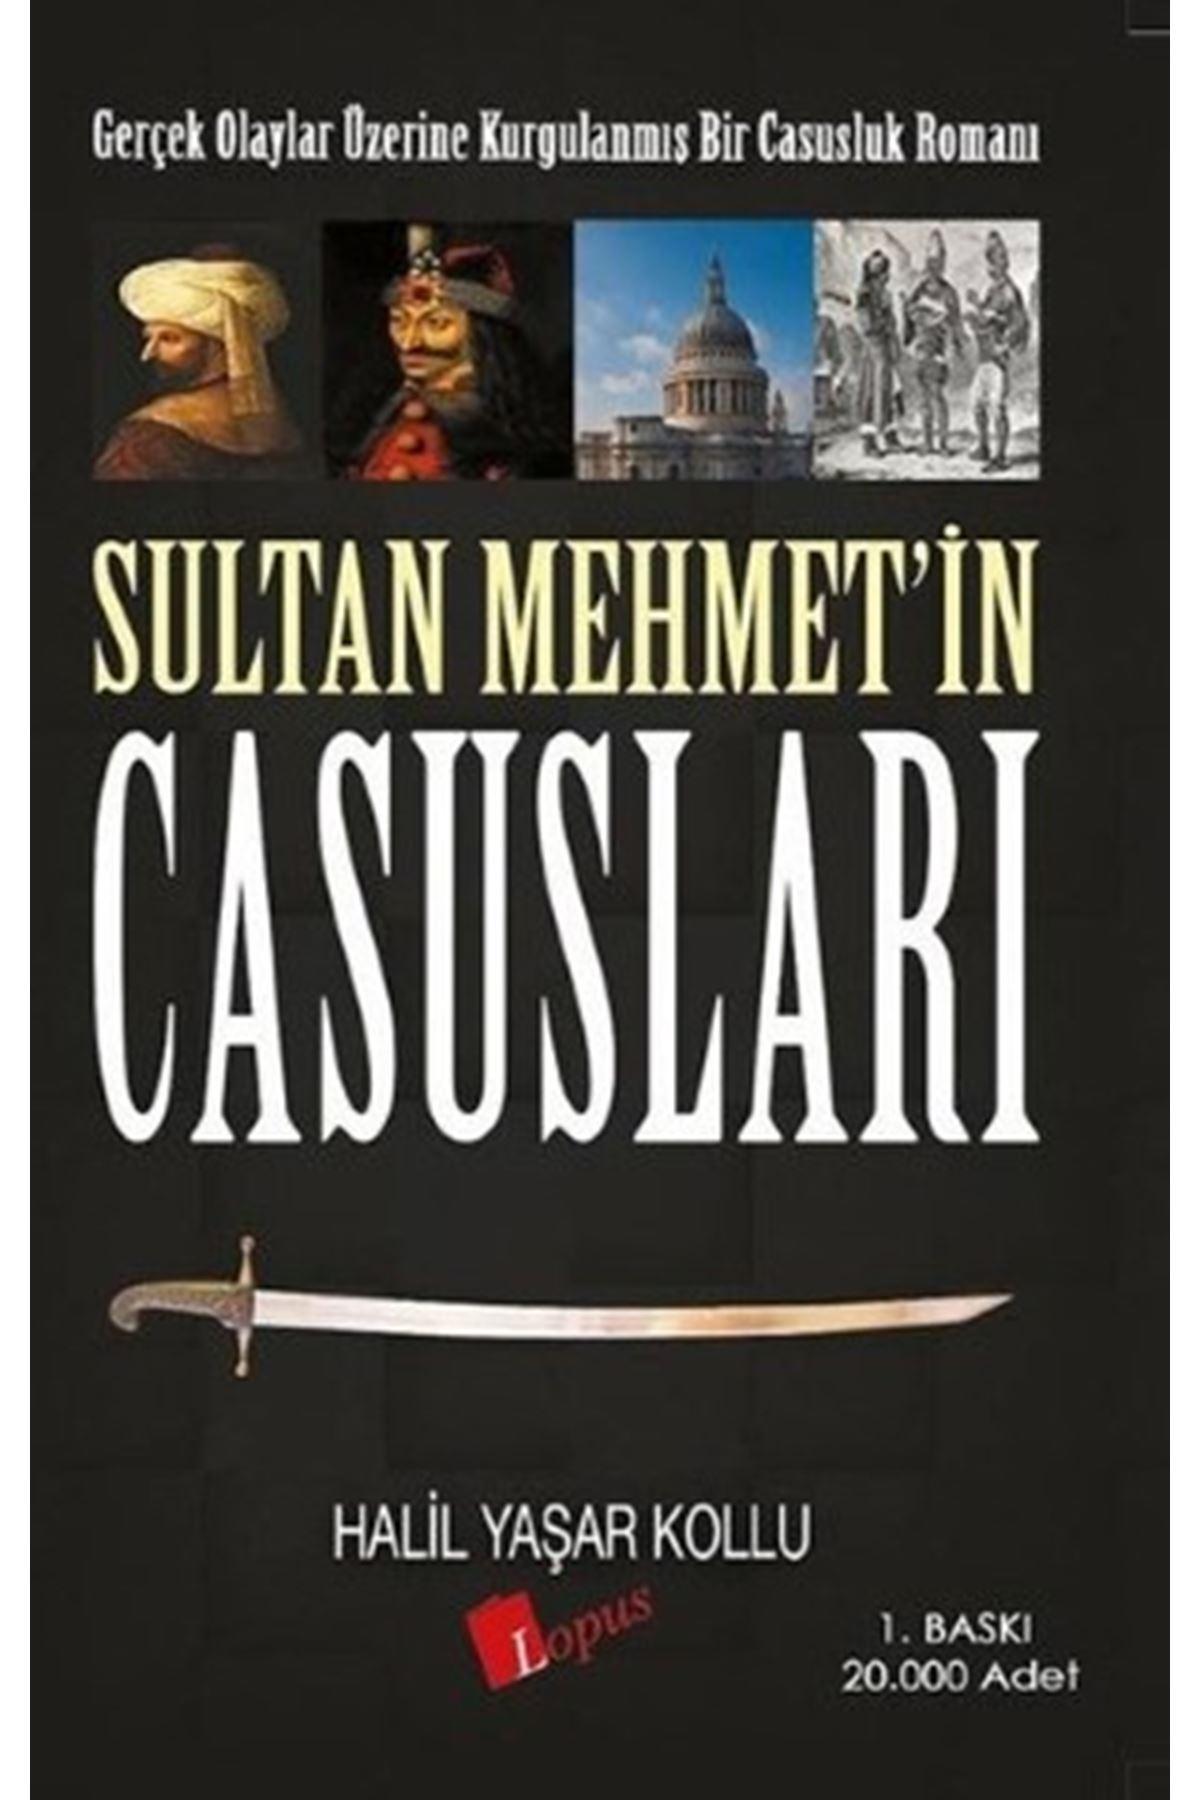 HALİL YAŞAR KOLLU - SULTAN MEHMET'İN CASUSLARI